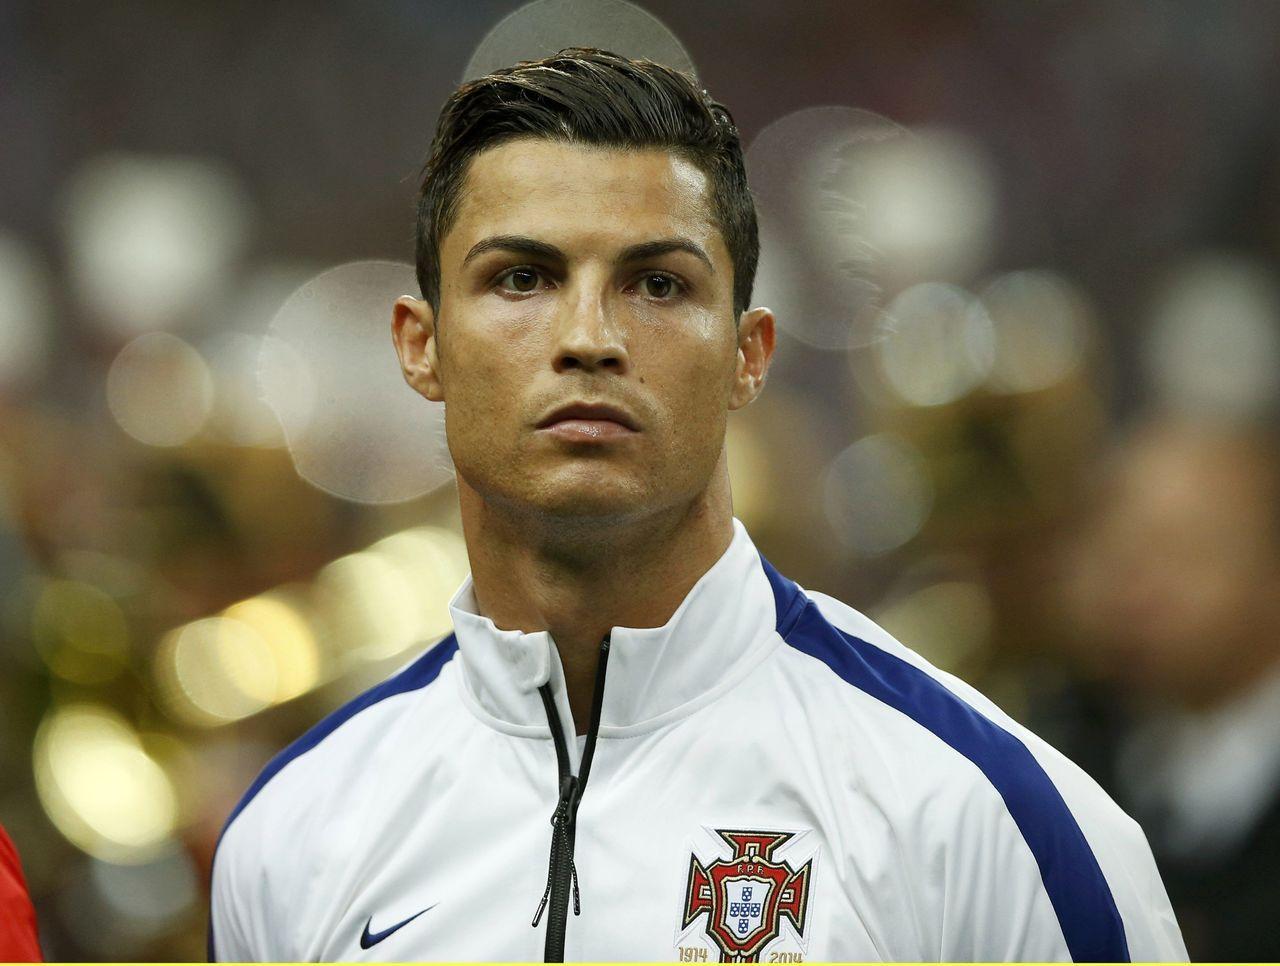 cristiano ronaldo 2016 | Cristano ronaldo, Cristiano ronaldo hairstyle,  Ronaldo